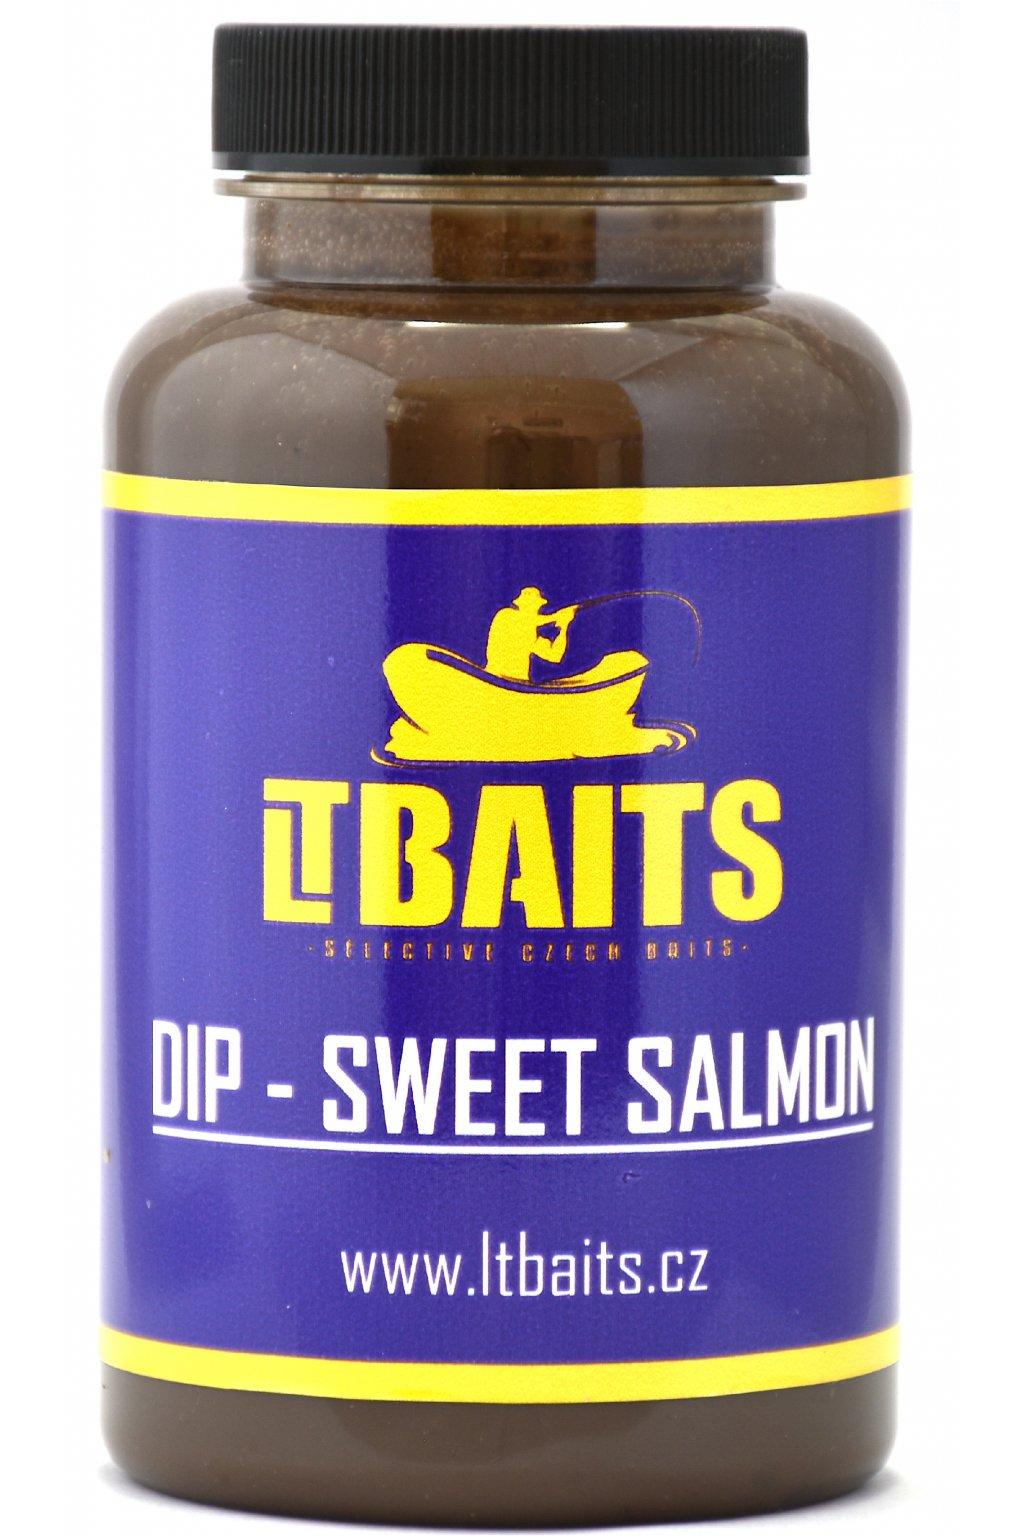 LT Baits DIP Sweet Salmon - 300g